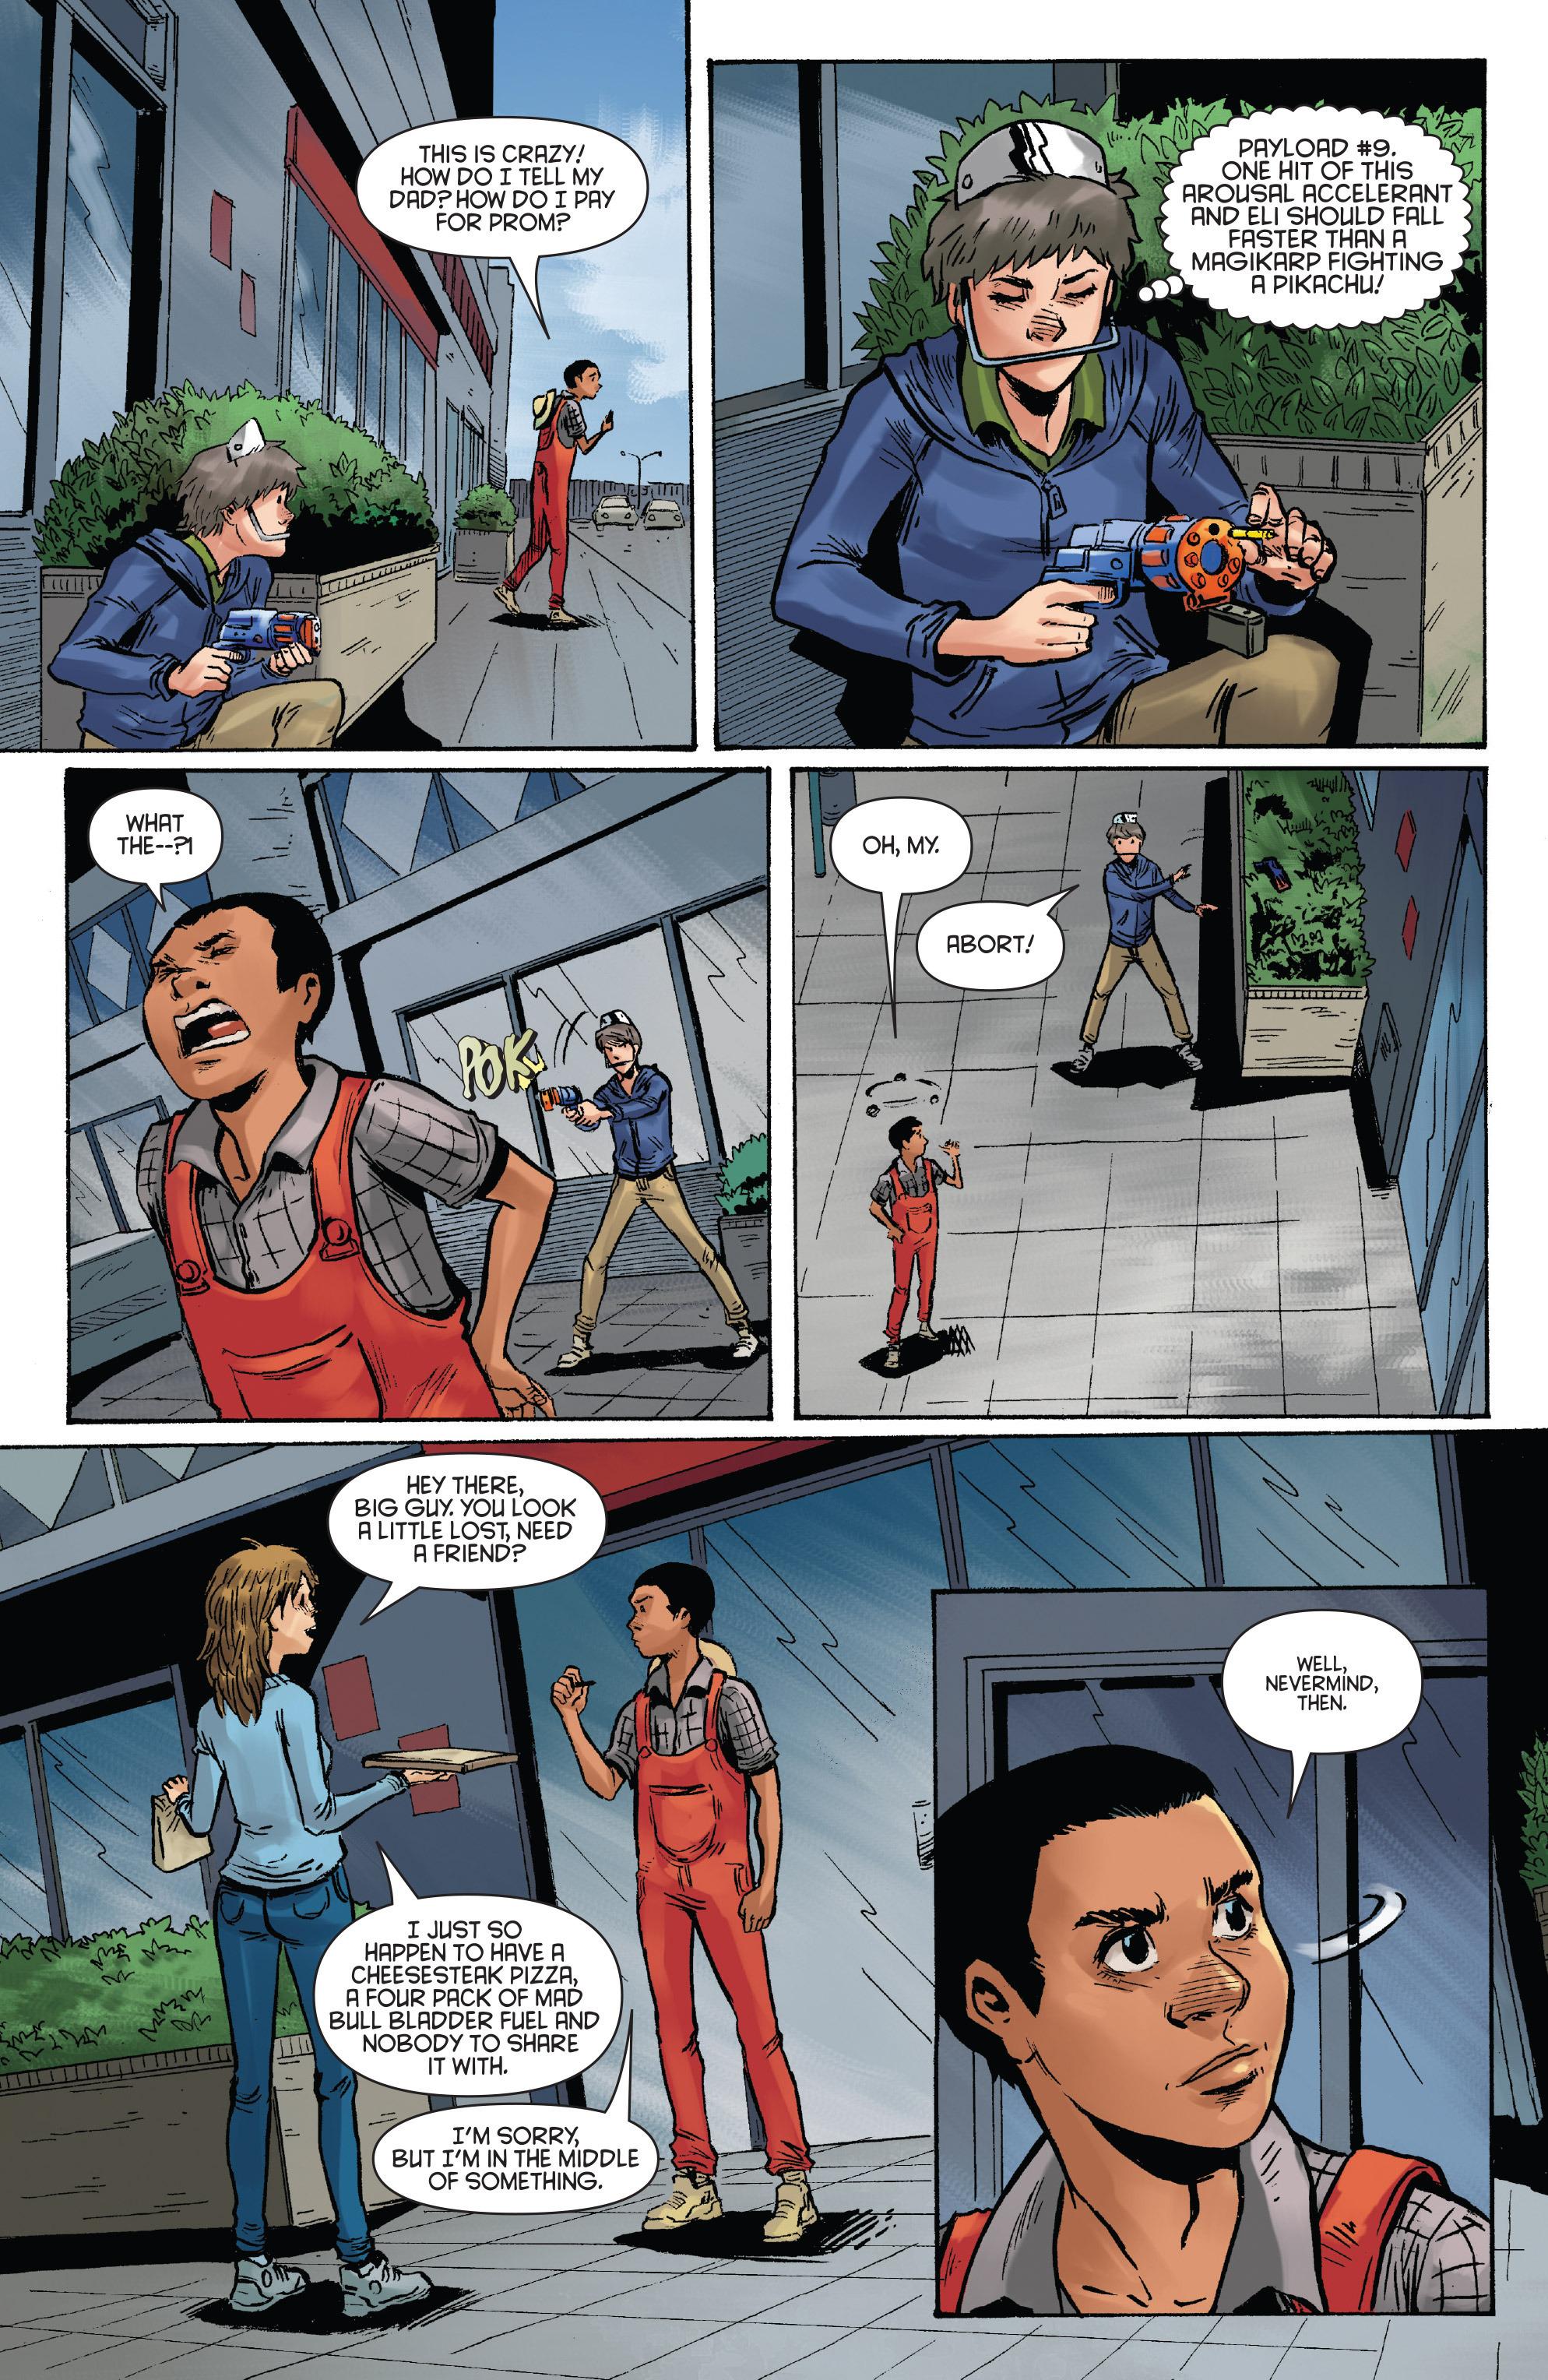 Read online Smosh comic -  Issue #2 - 11